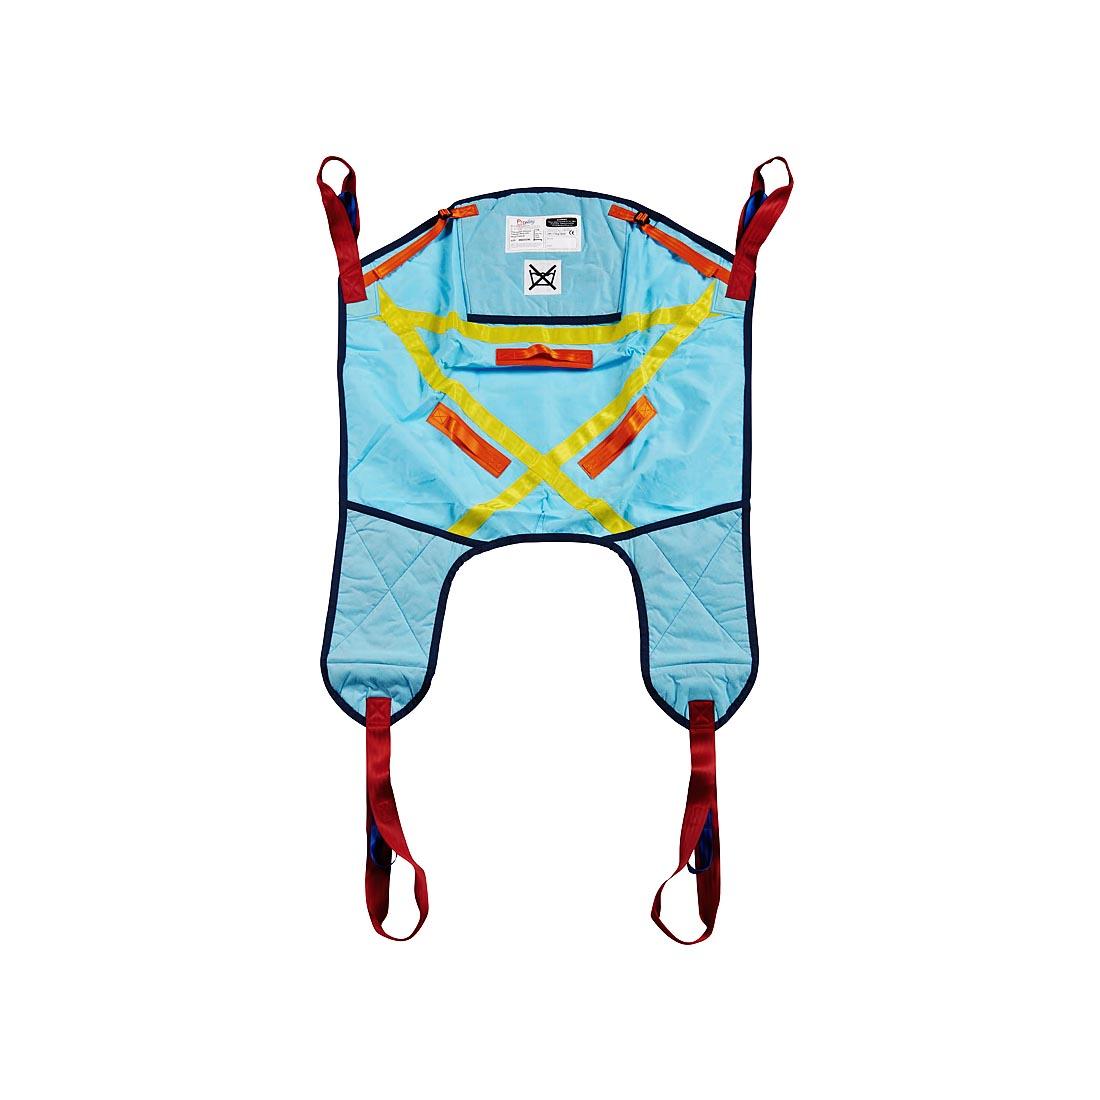 Disposable Lifter Hoist Sling